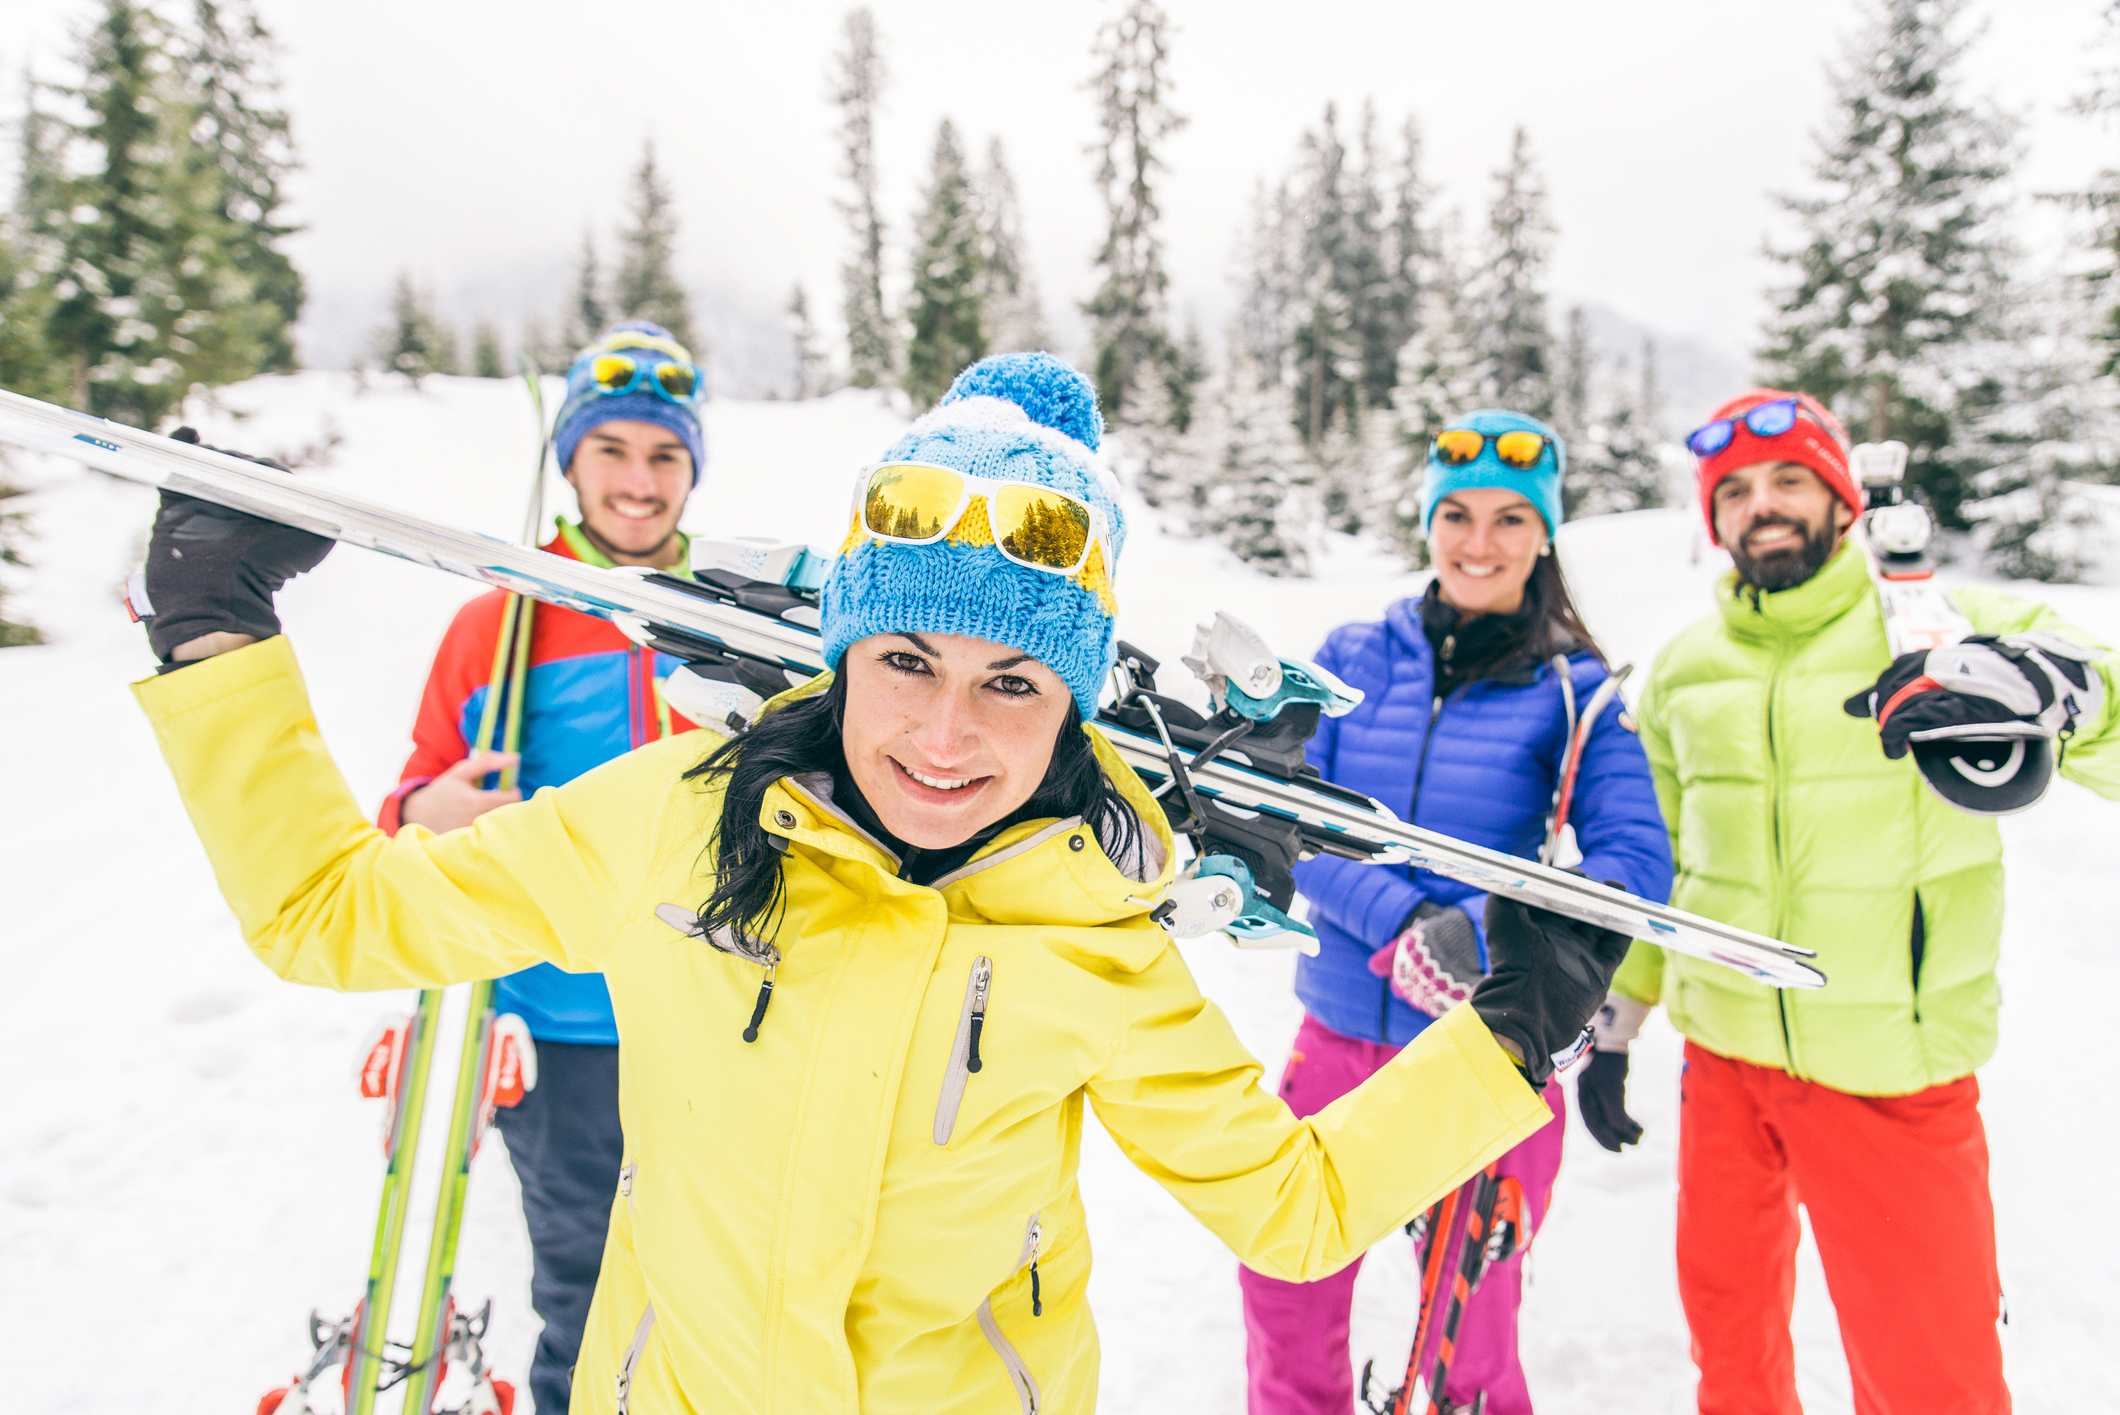 rencontre celibataire ski